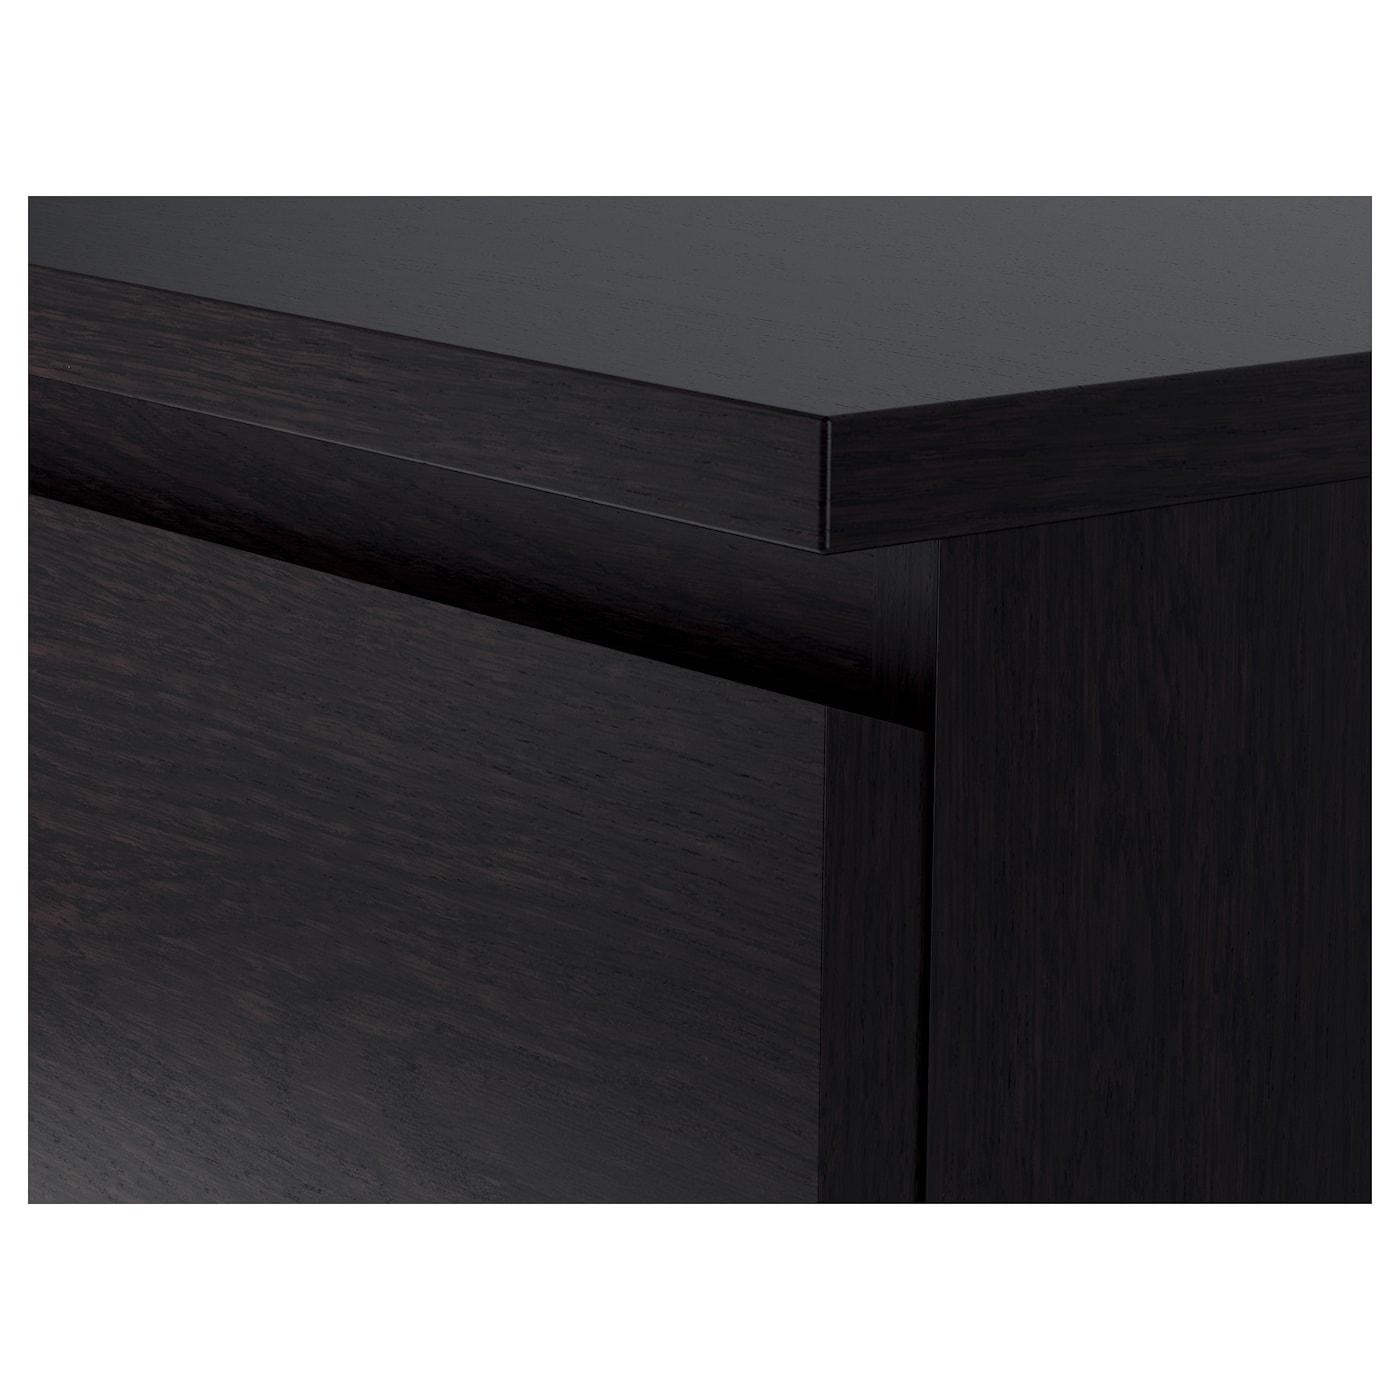 MALM خزانة بـ 3 أدراج, أسود-بني, 80x78 سم